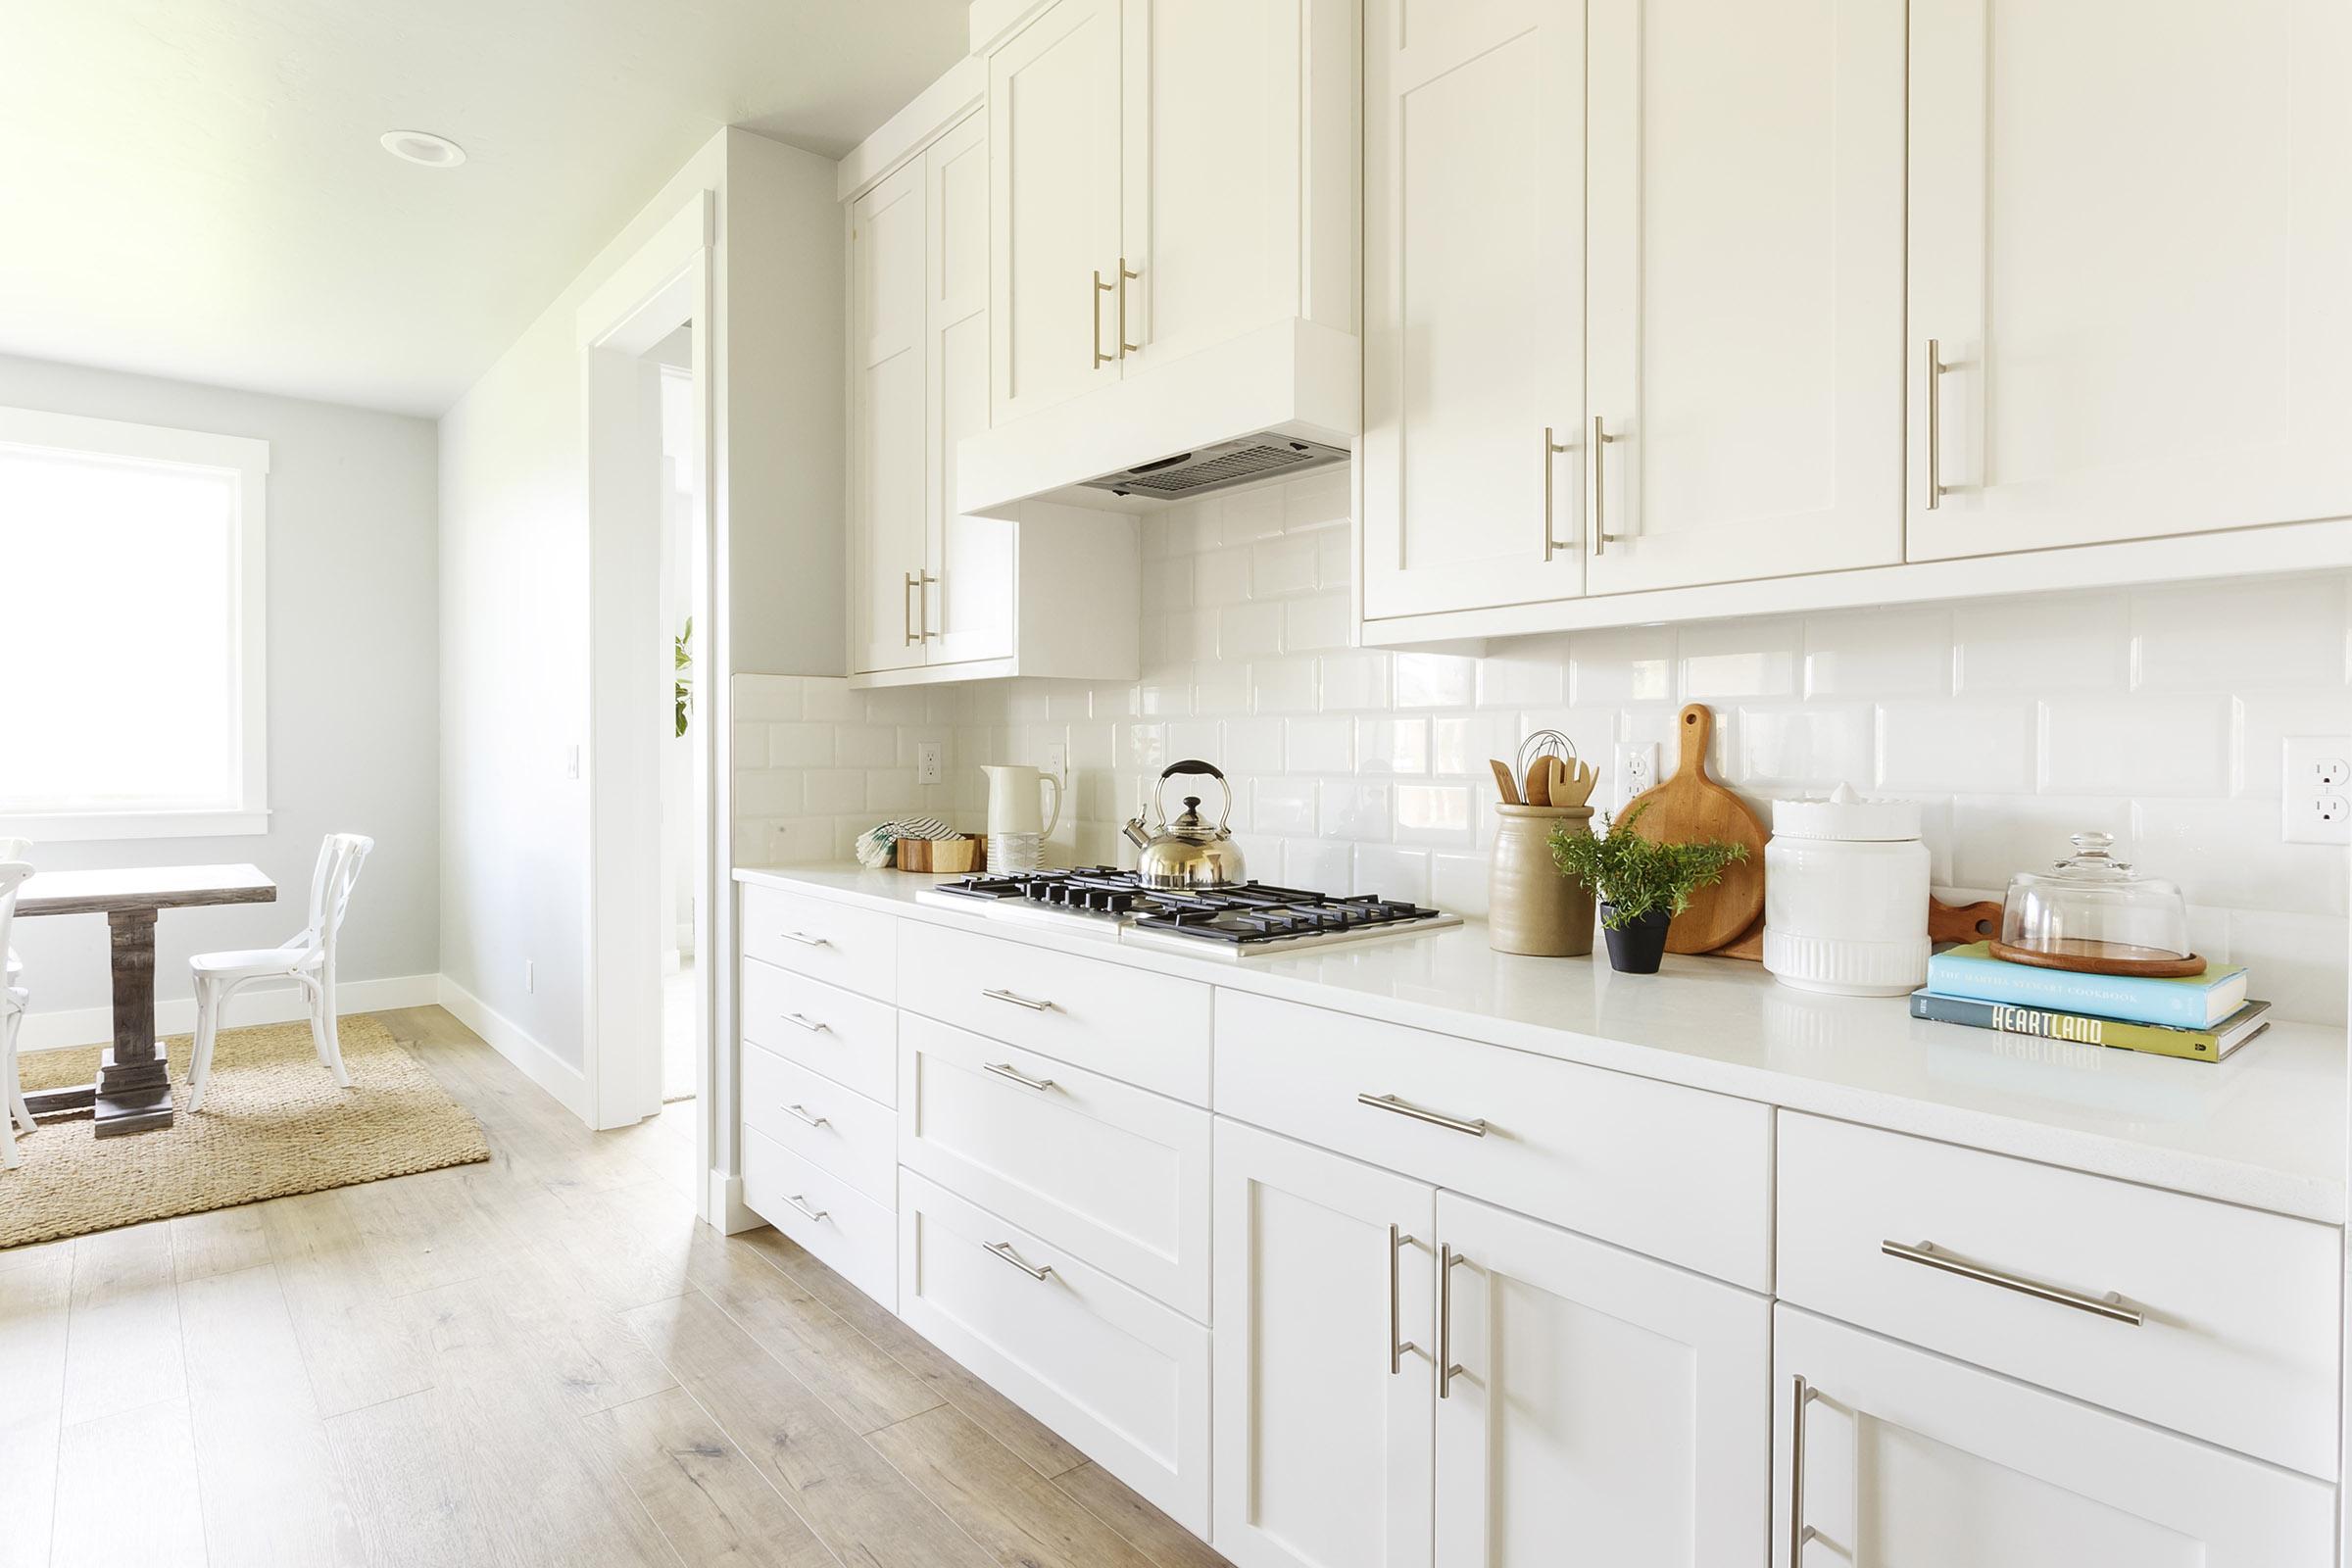 white tile backsplash in kitchen